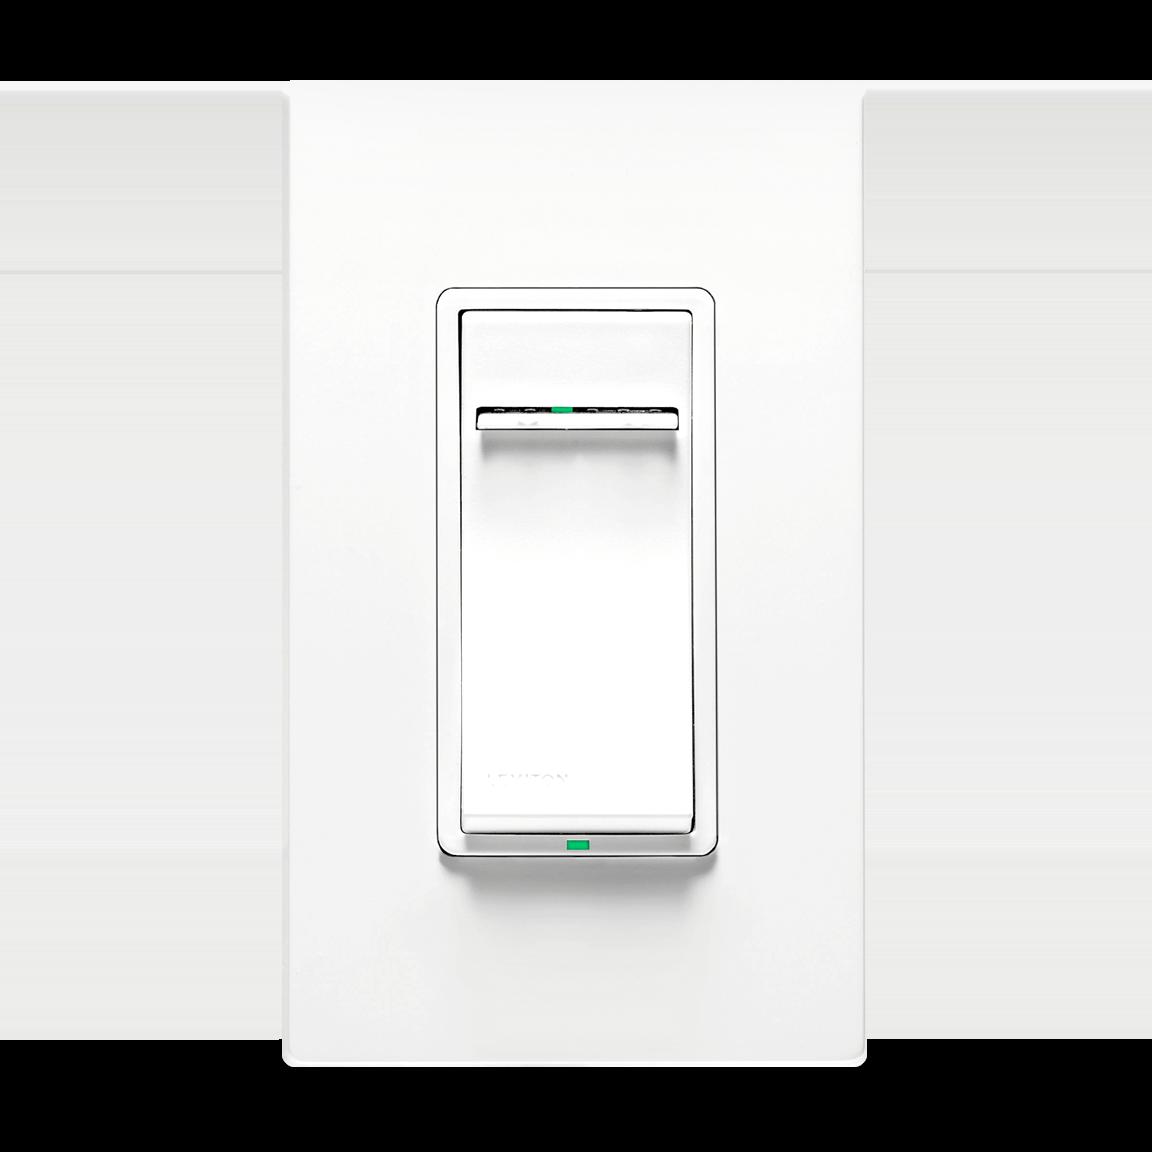 SmartThings - Leviton Universal Dimmer